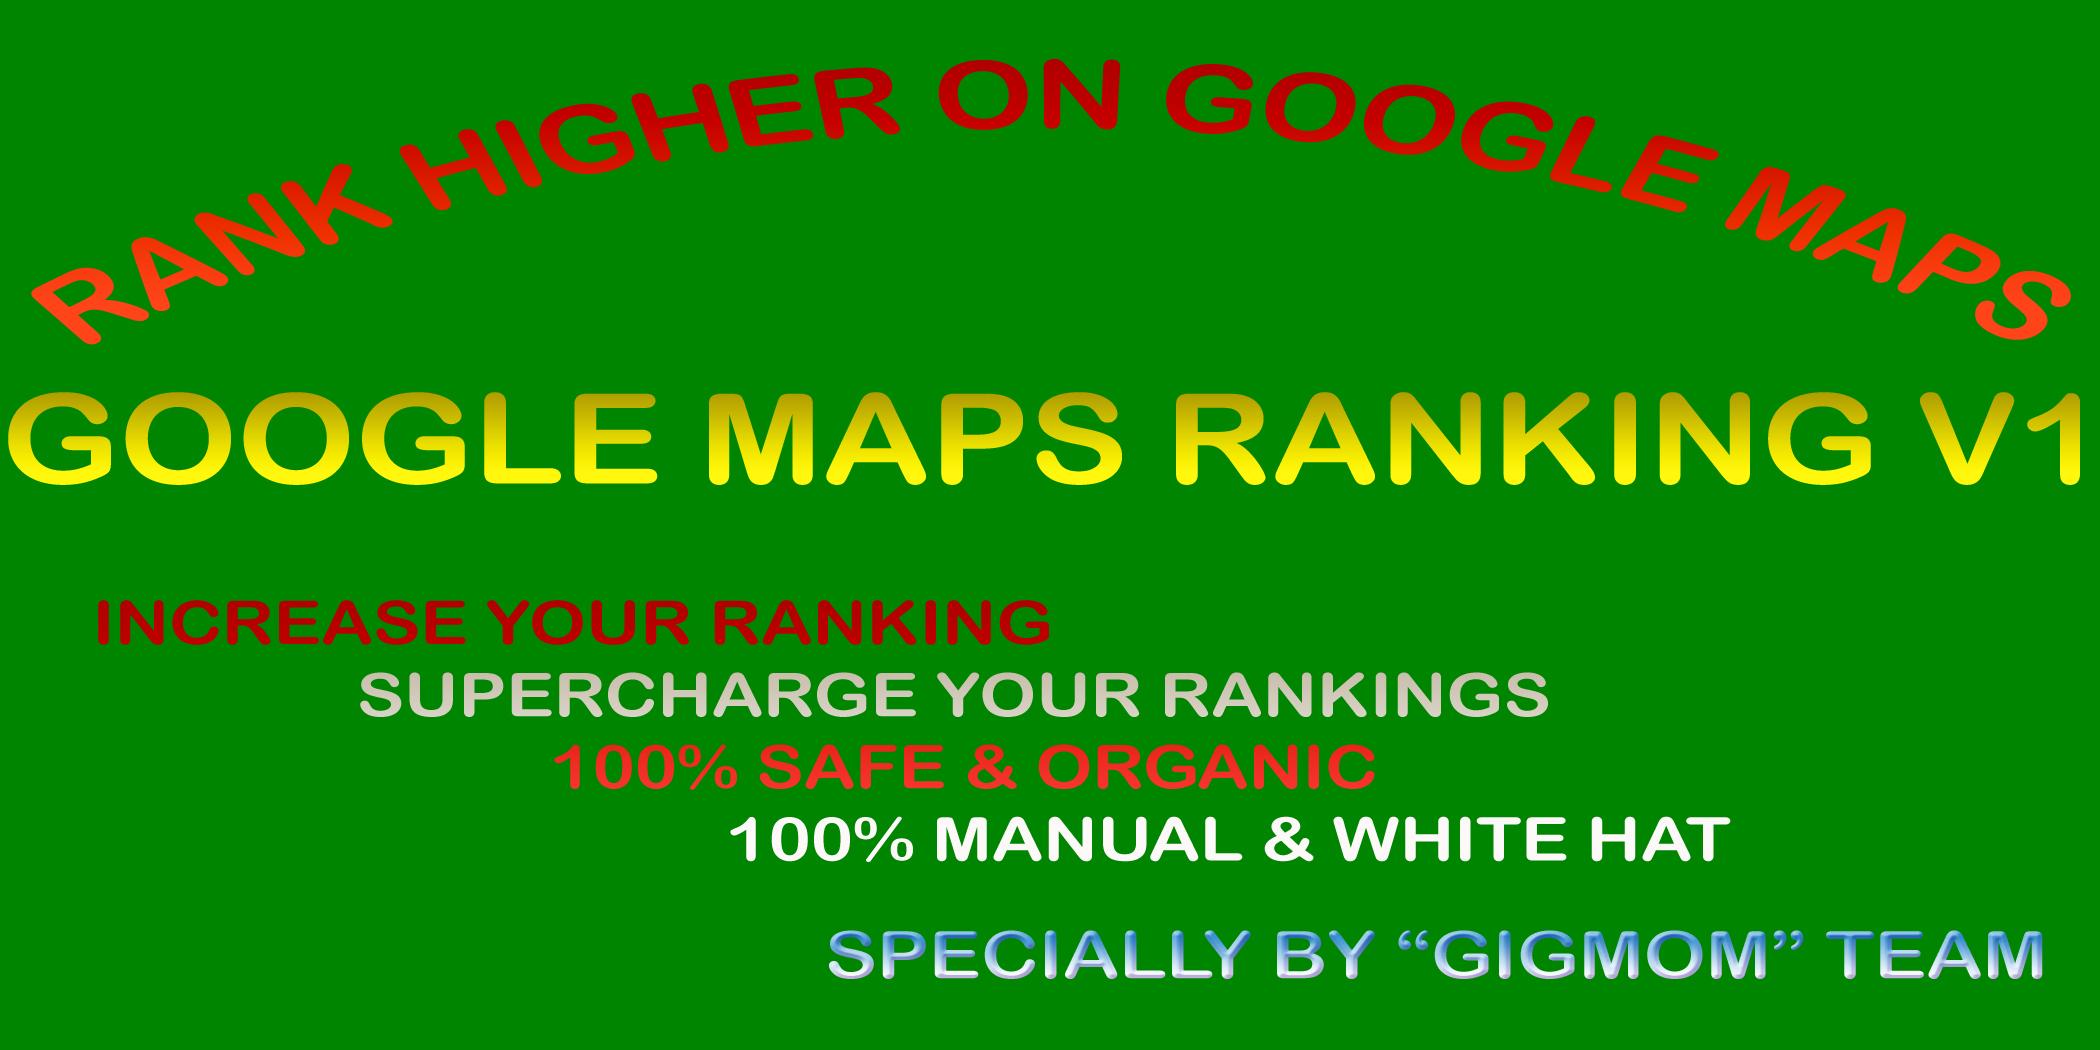 Google Maps Ranking v1 Rank Higher On Google Maps